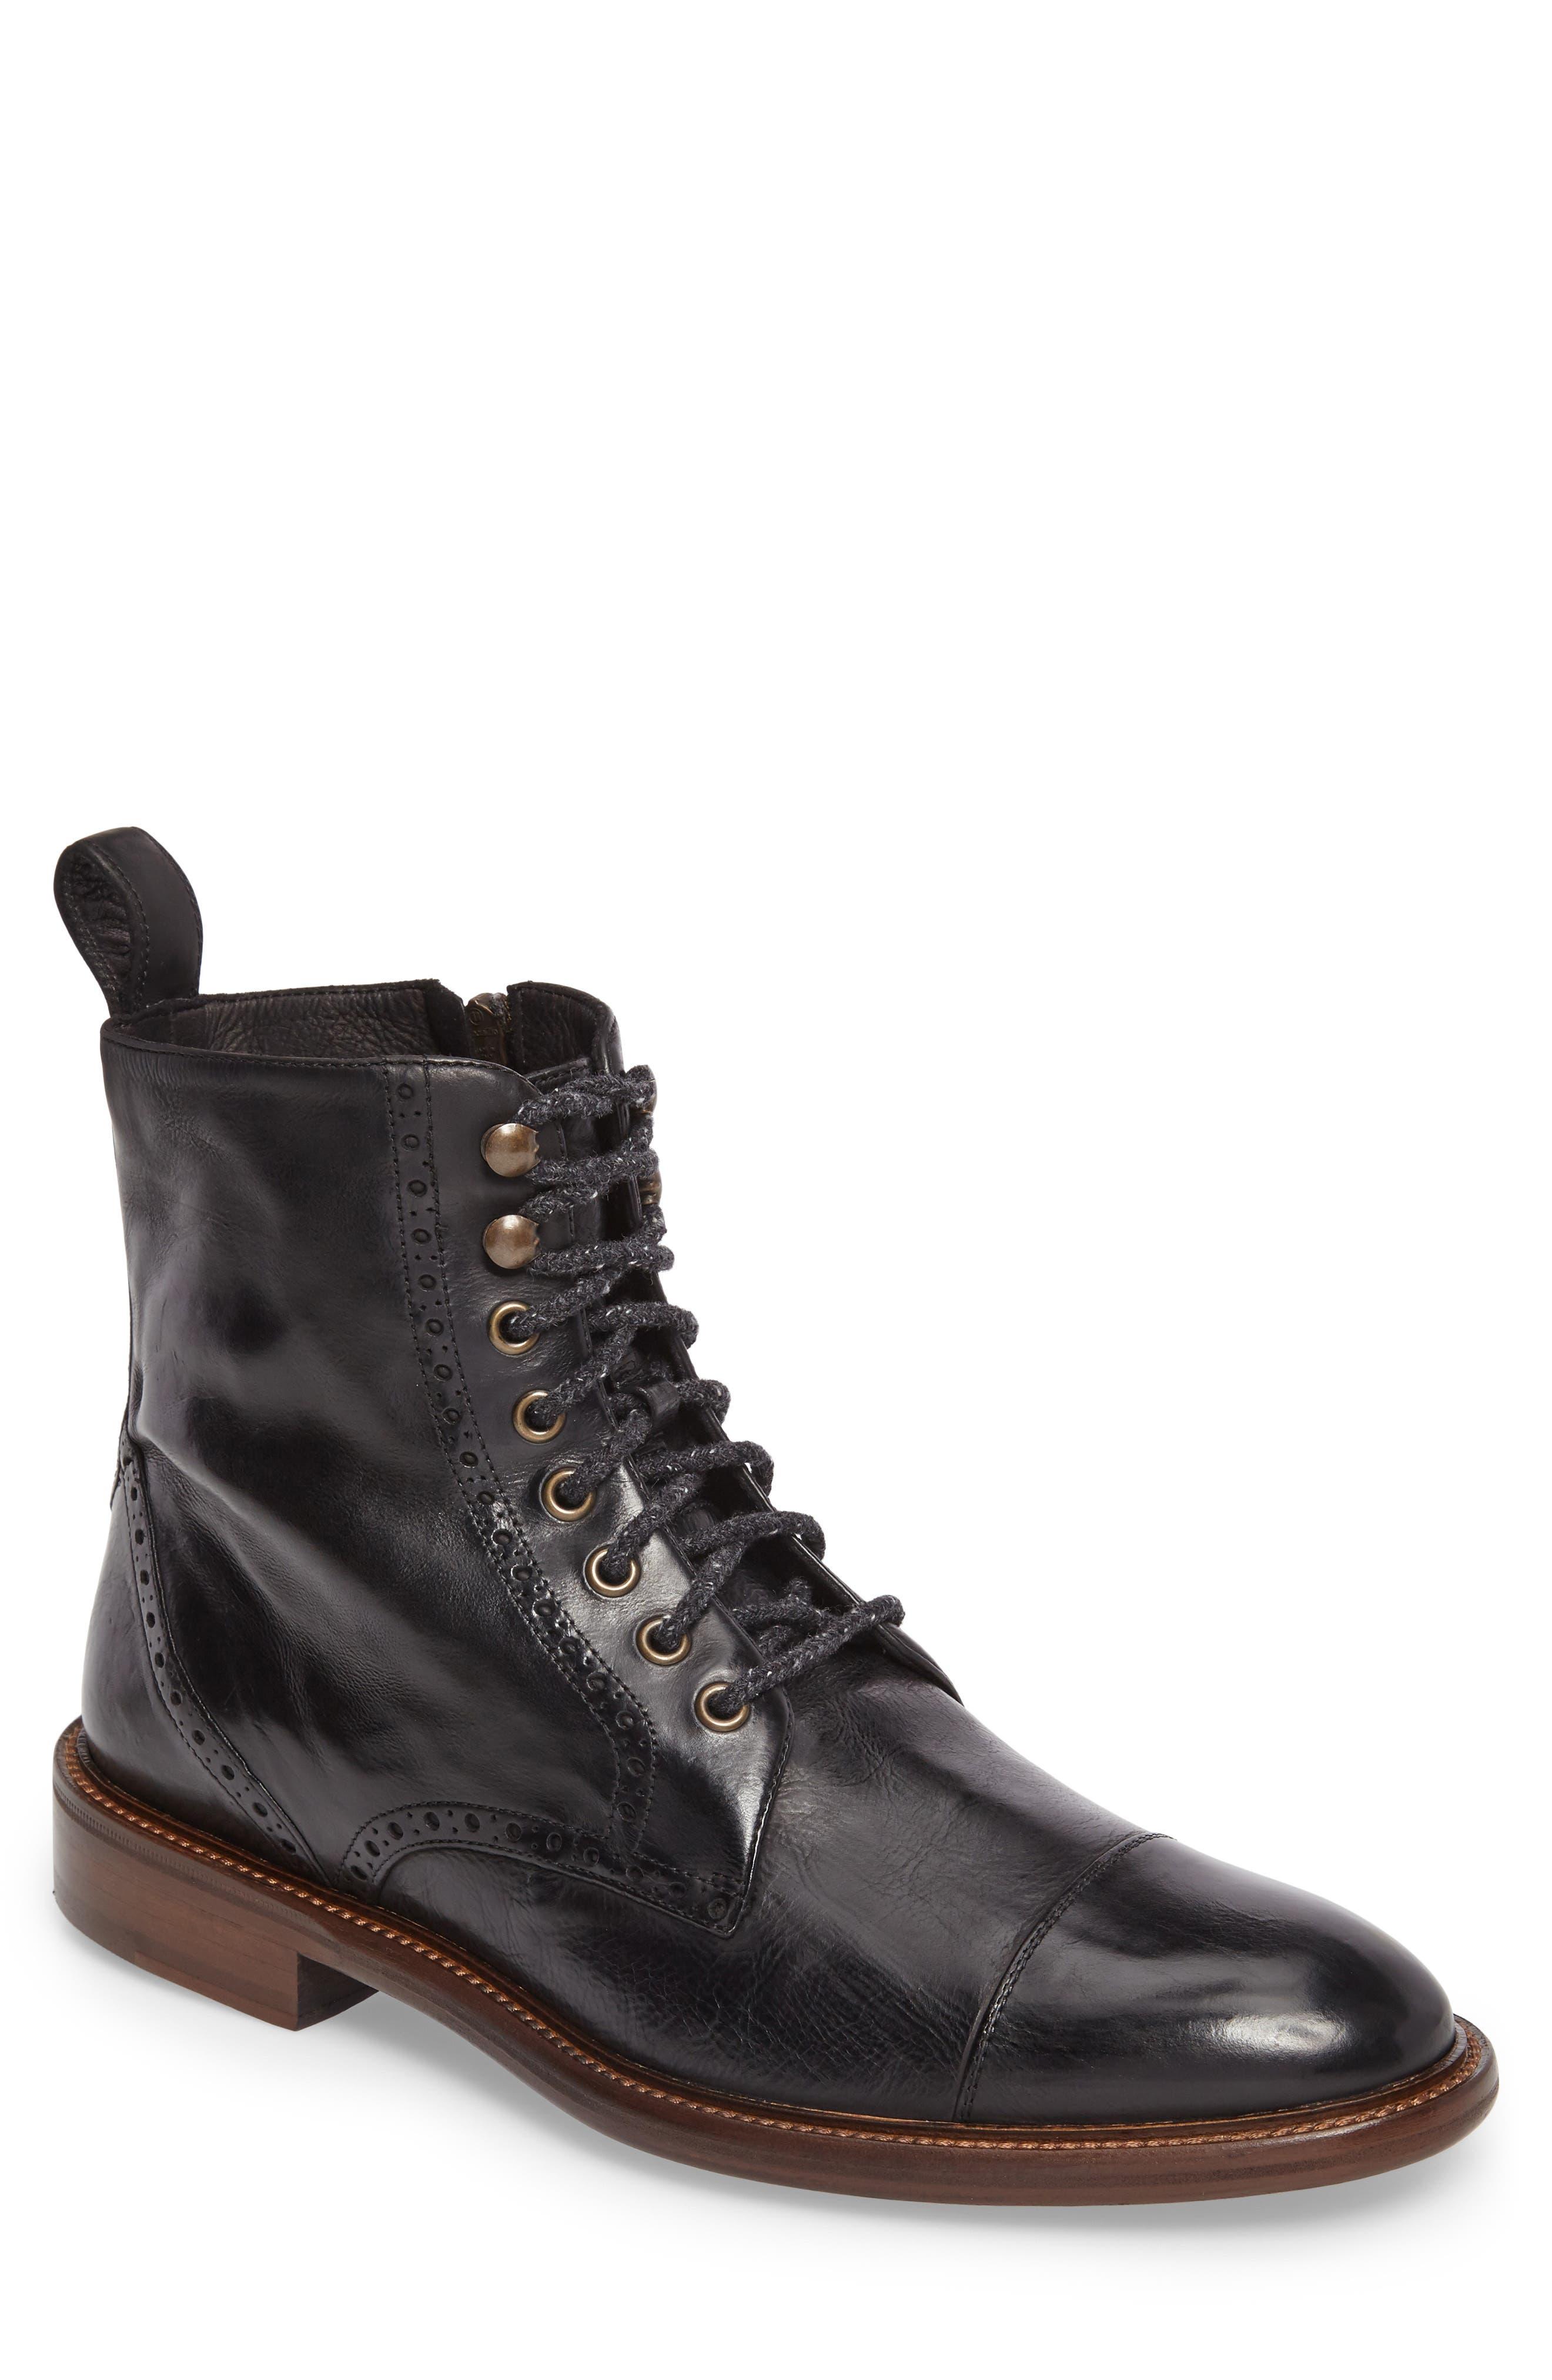 Main Image - J&M 1850 Bryson Cap Toe Boot (Men)